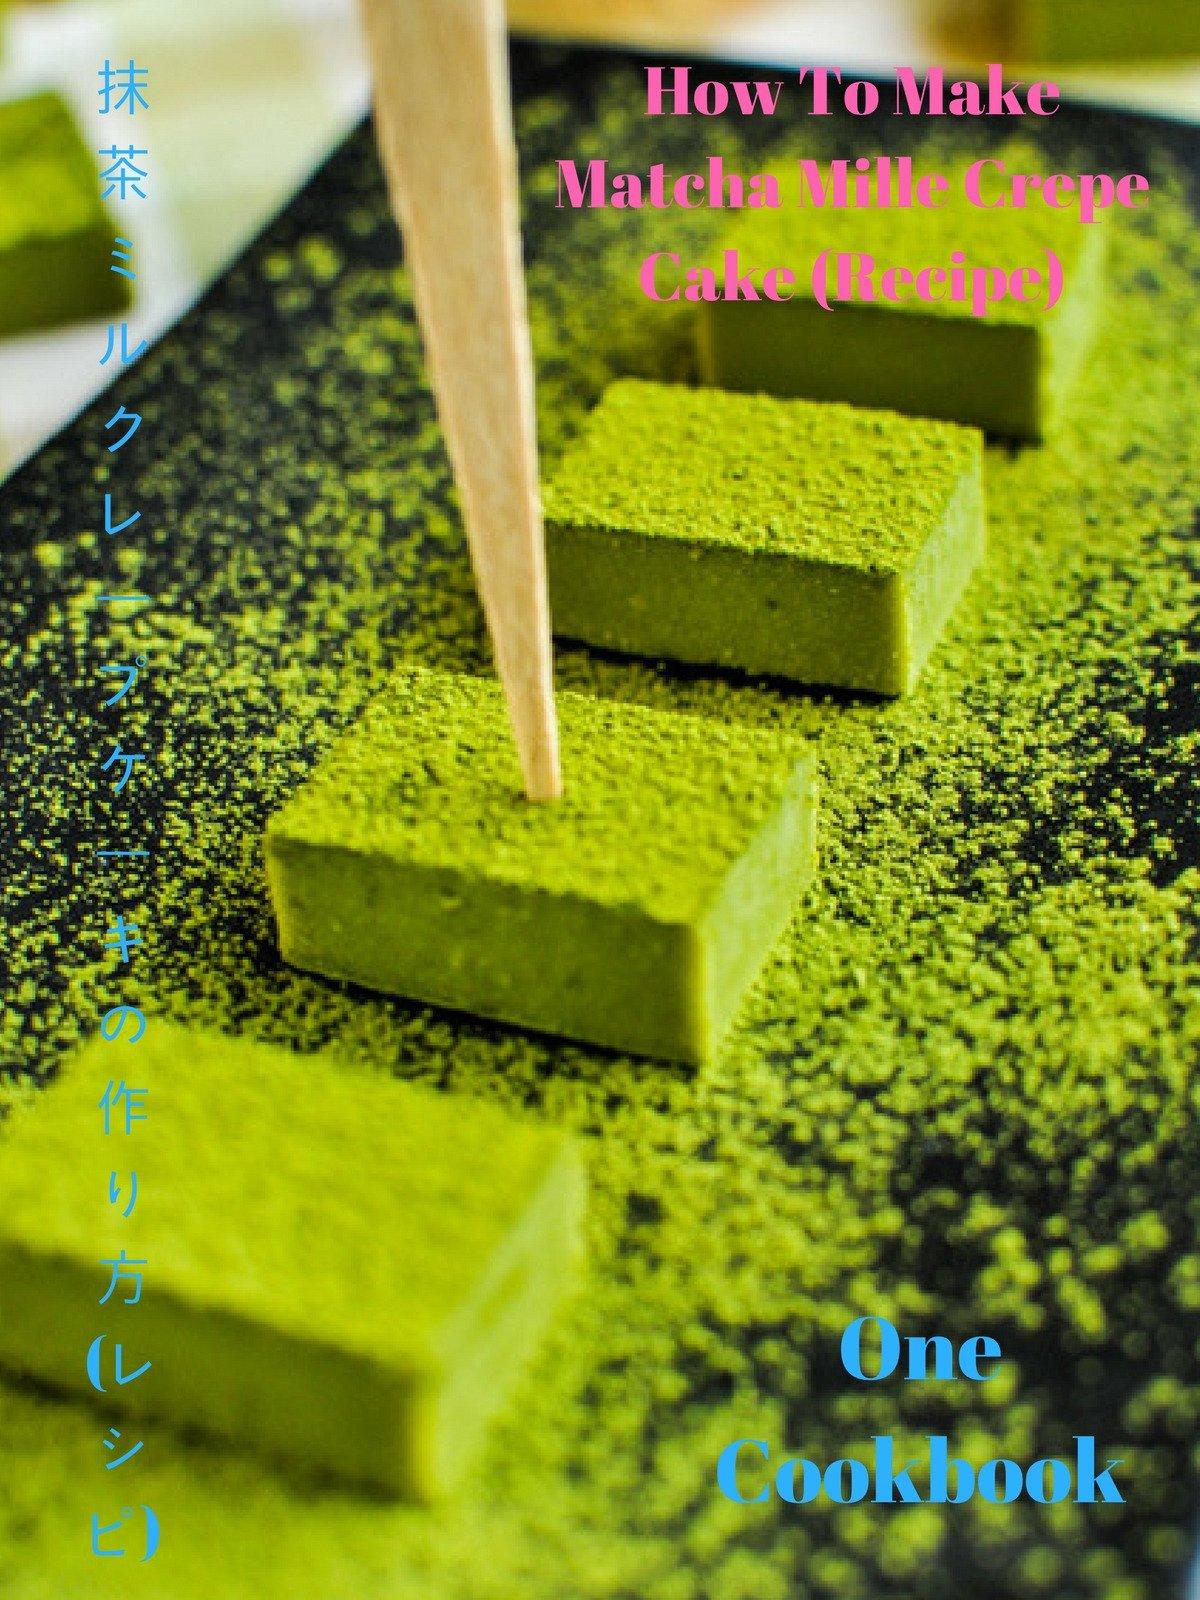 Clip: How To Make Matcha Mille Crepe Cake (Recipe) 抹茶ミルクレープケーキの作り方 (レシピ)